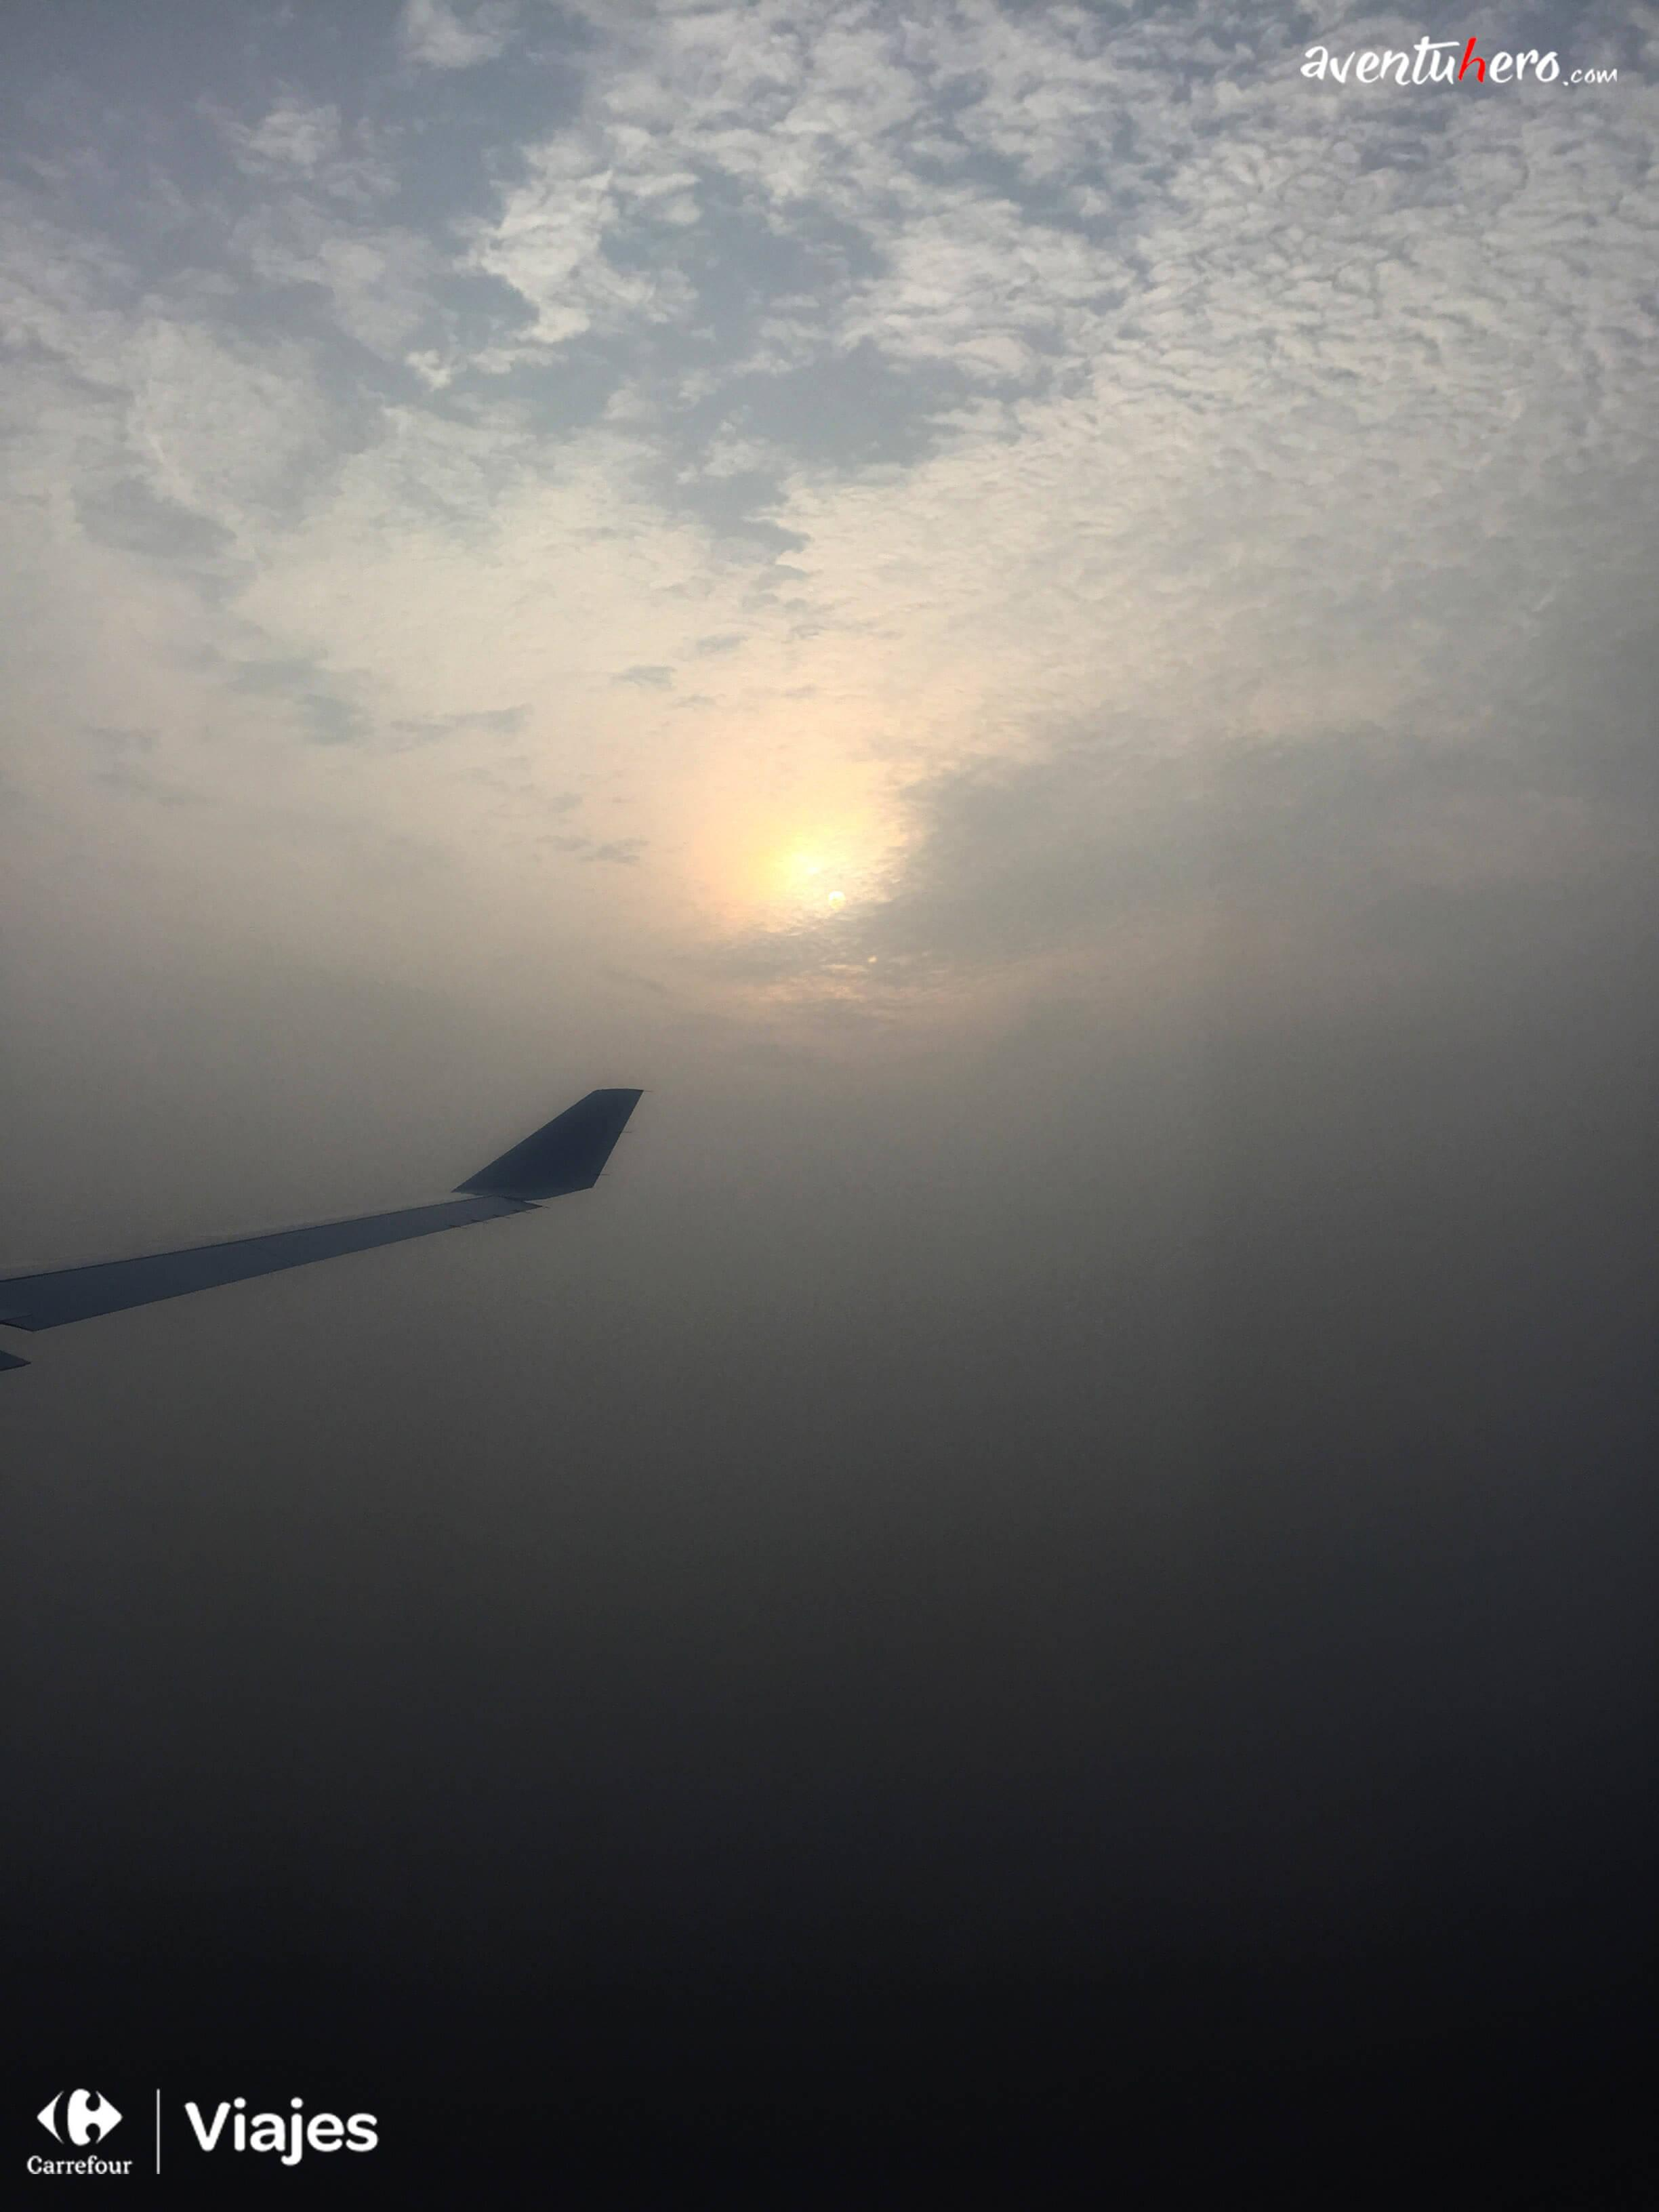 Aventuhero - Llegando a China